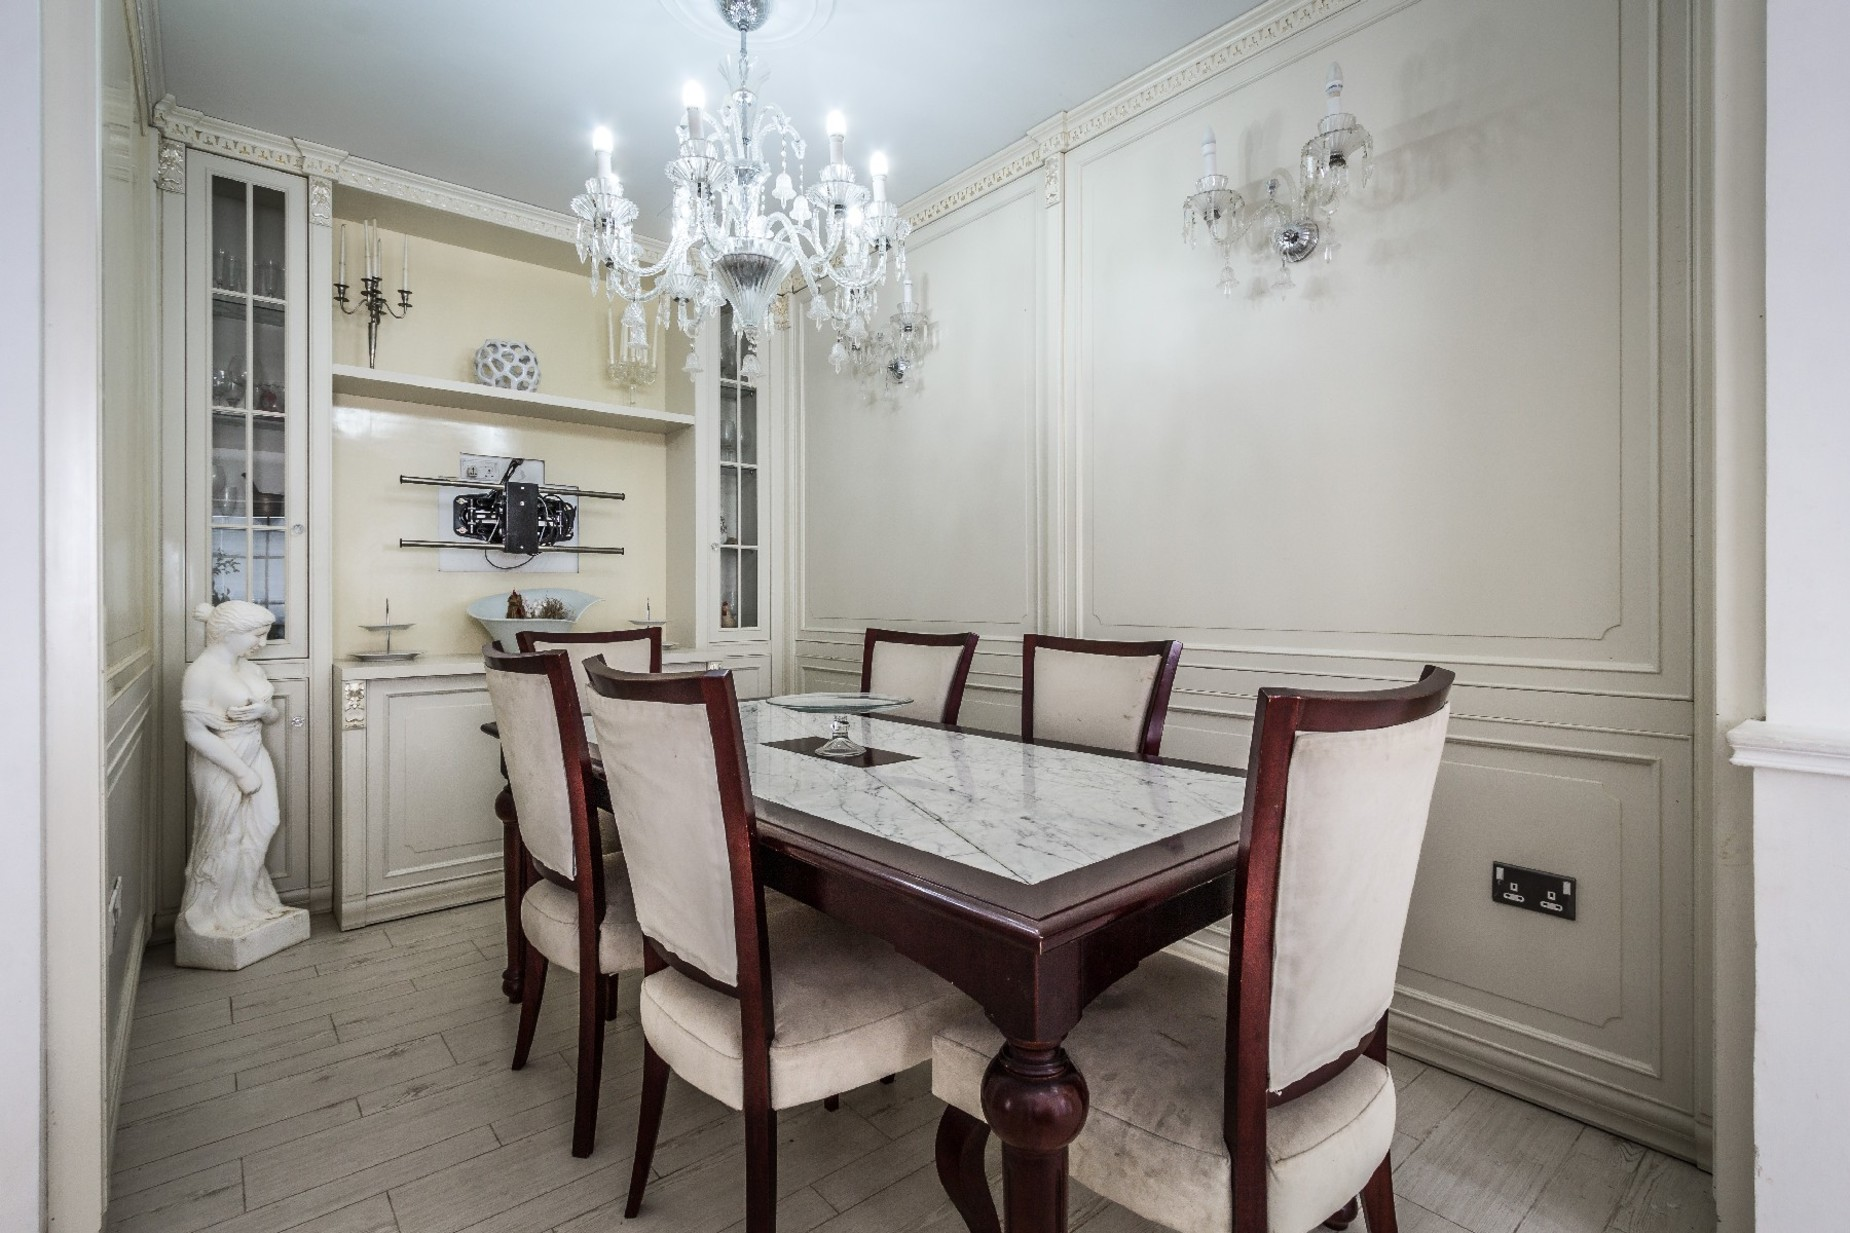 3 bed Villa For Sale in San Gwann, San Gwann - thumb 5